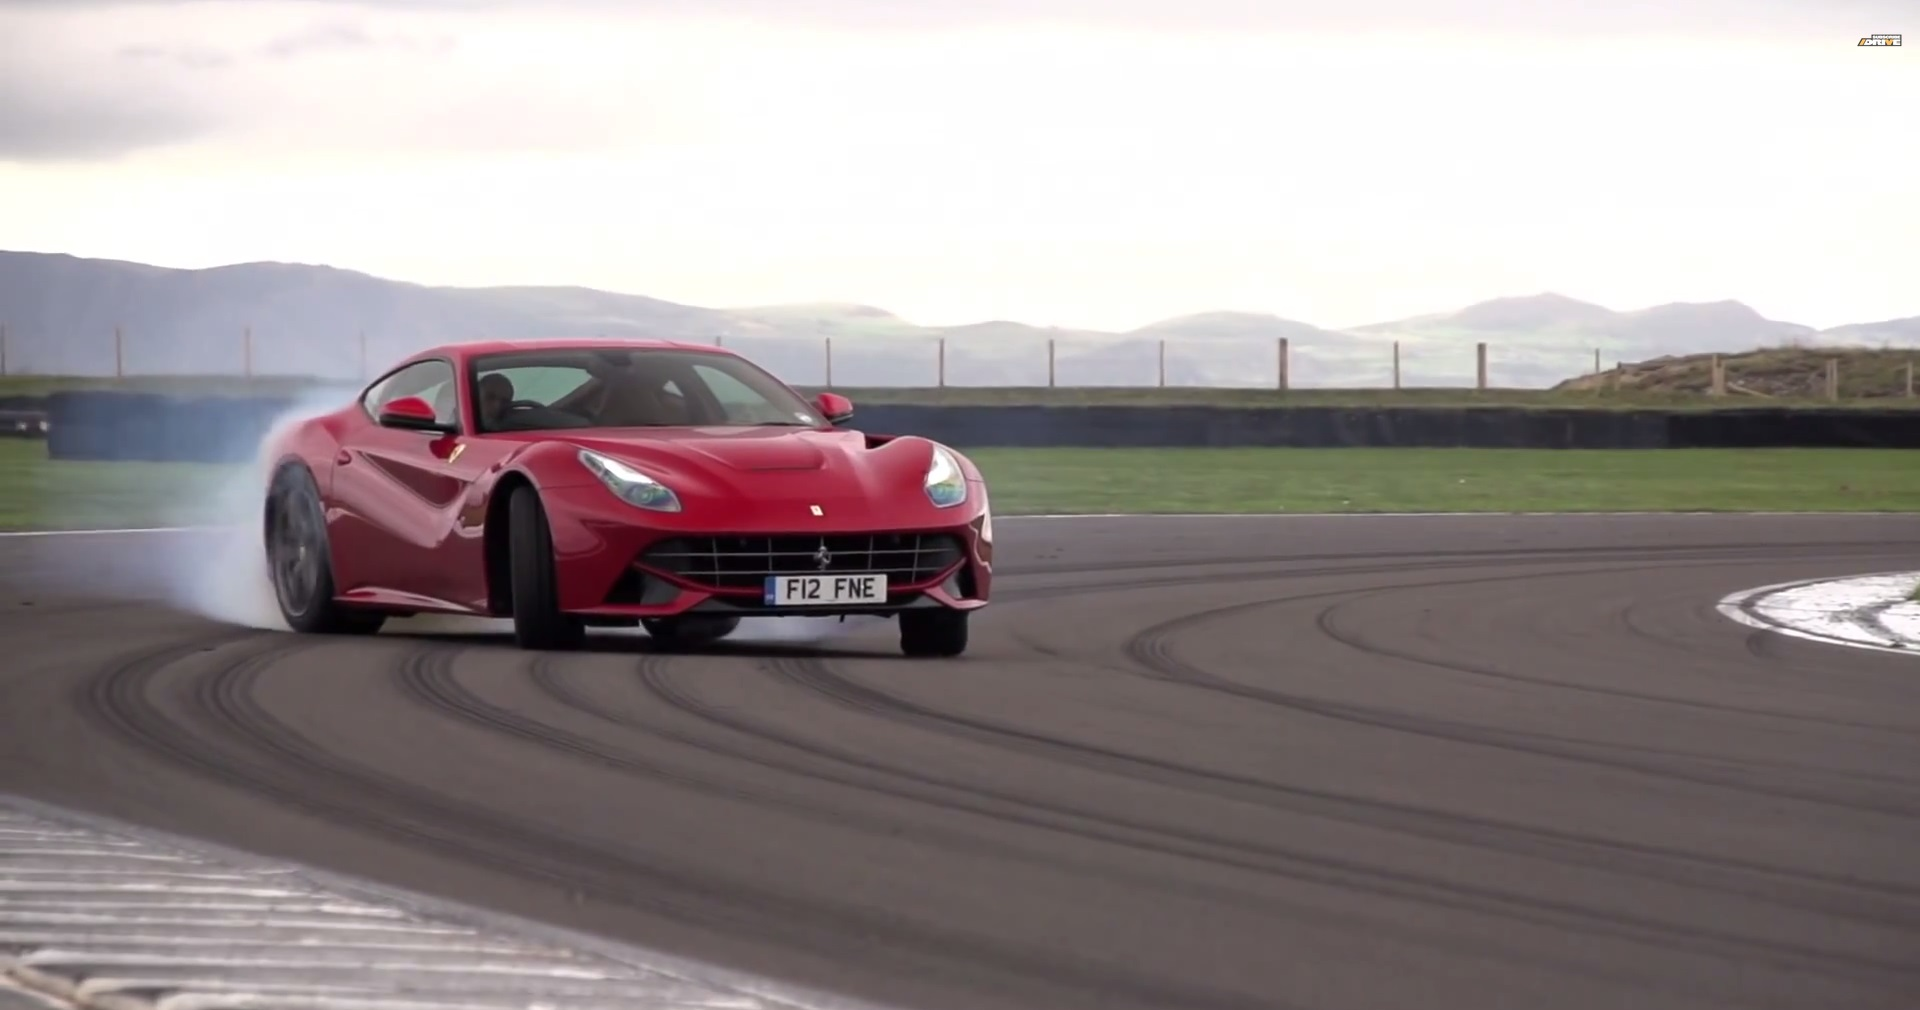 Ferrari F12 Berlinetta - Chris Harris On Cars - www.hartvoorautos.nl